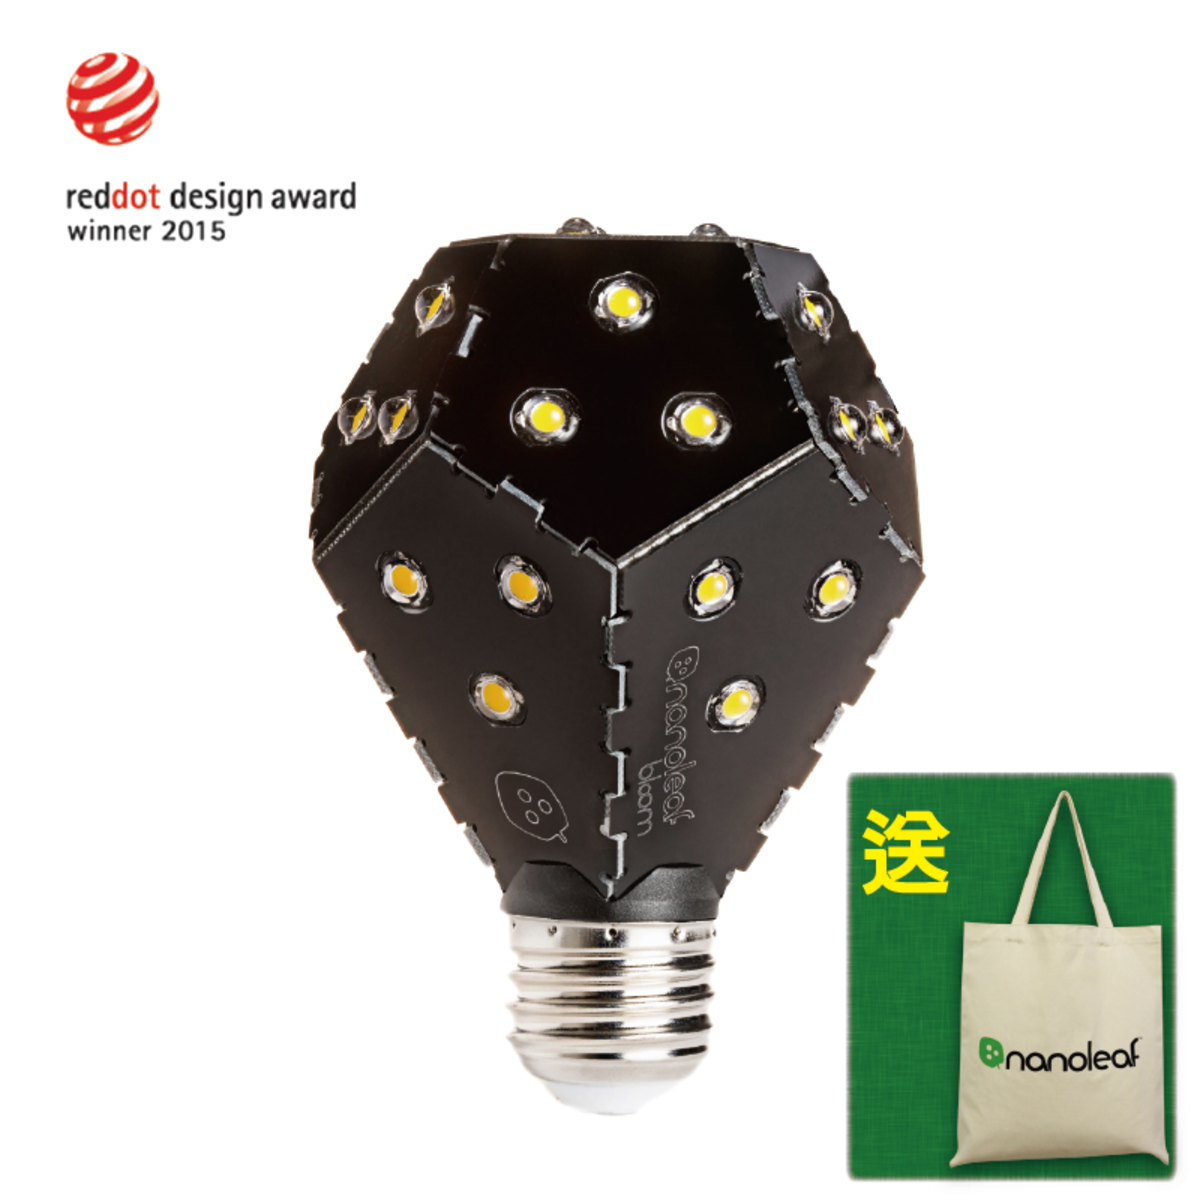 Nanoleaf Bloom 環保燈膽 3000K 黑色 (每一訂單, 均附送帆布環保購物袋乙個, 送完即止!)